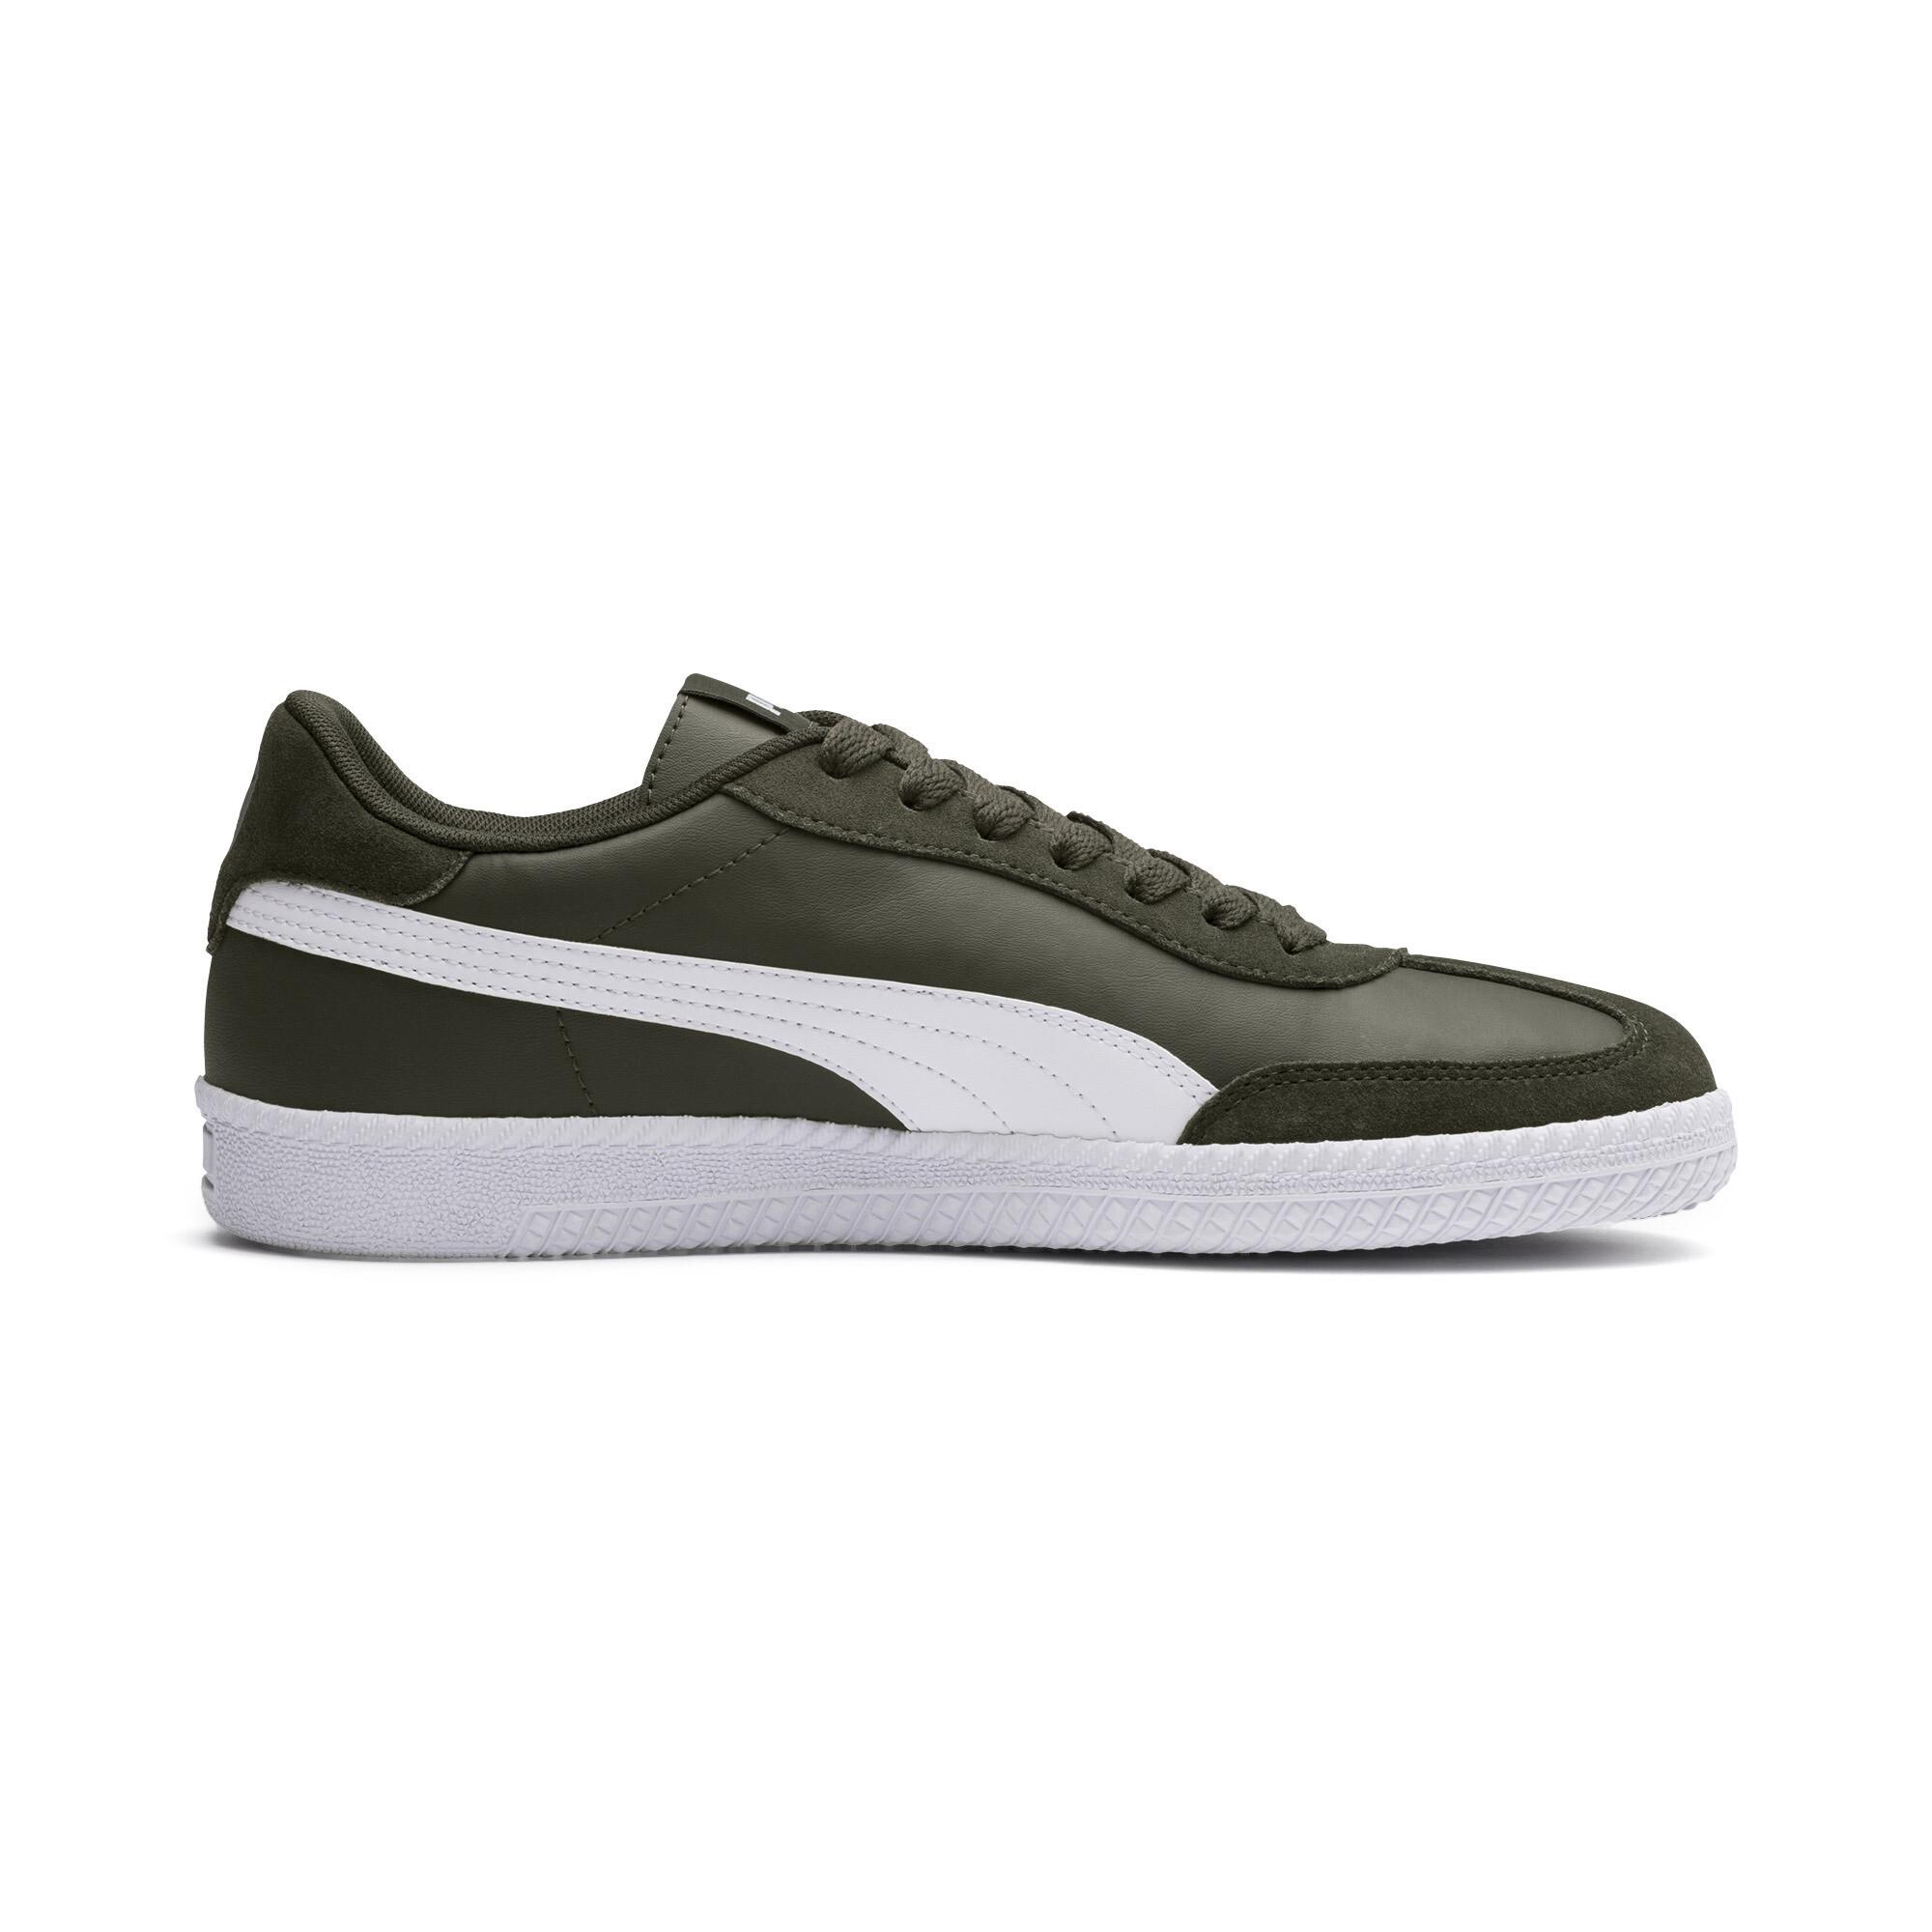 PUMA-Astro-Cup-Men-039-s-Sneakers-Men-Shoe-Basics thumbnail 6